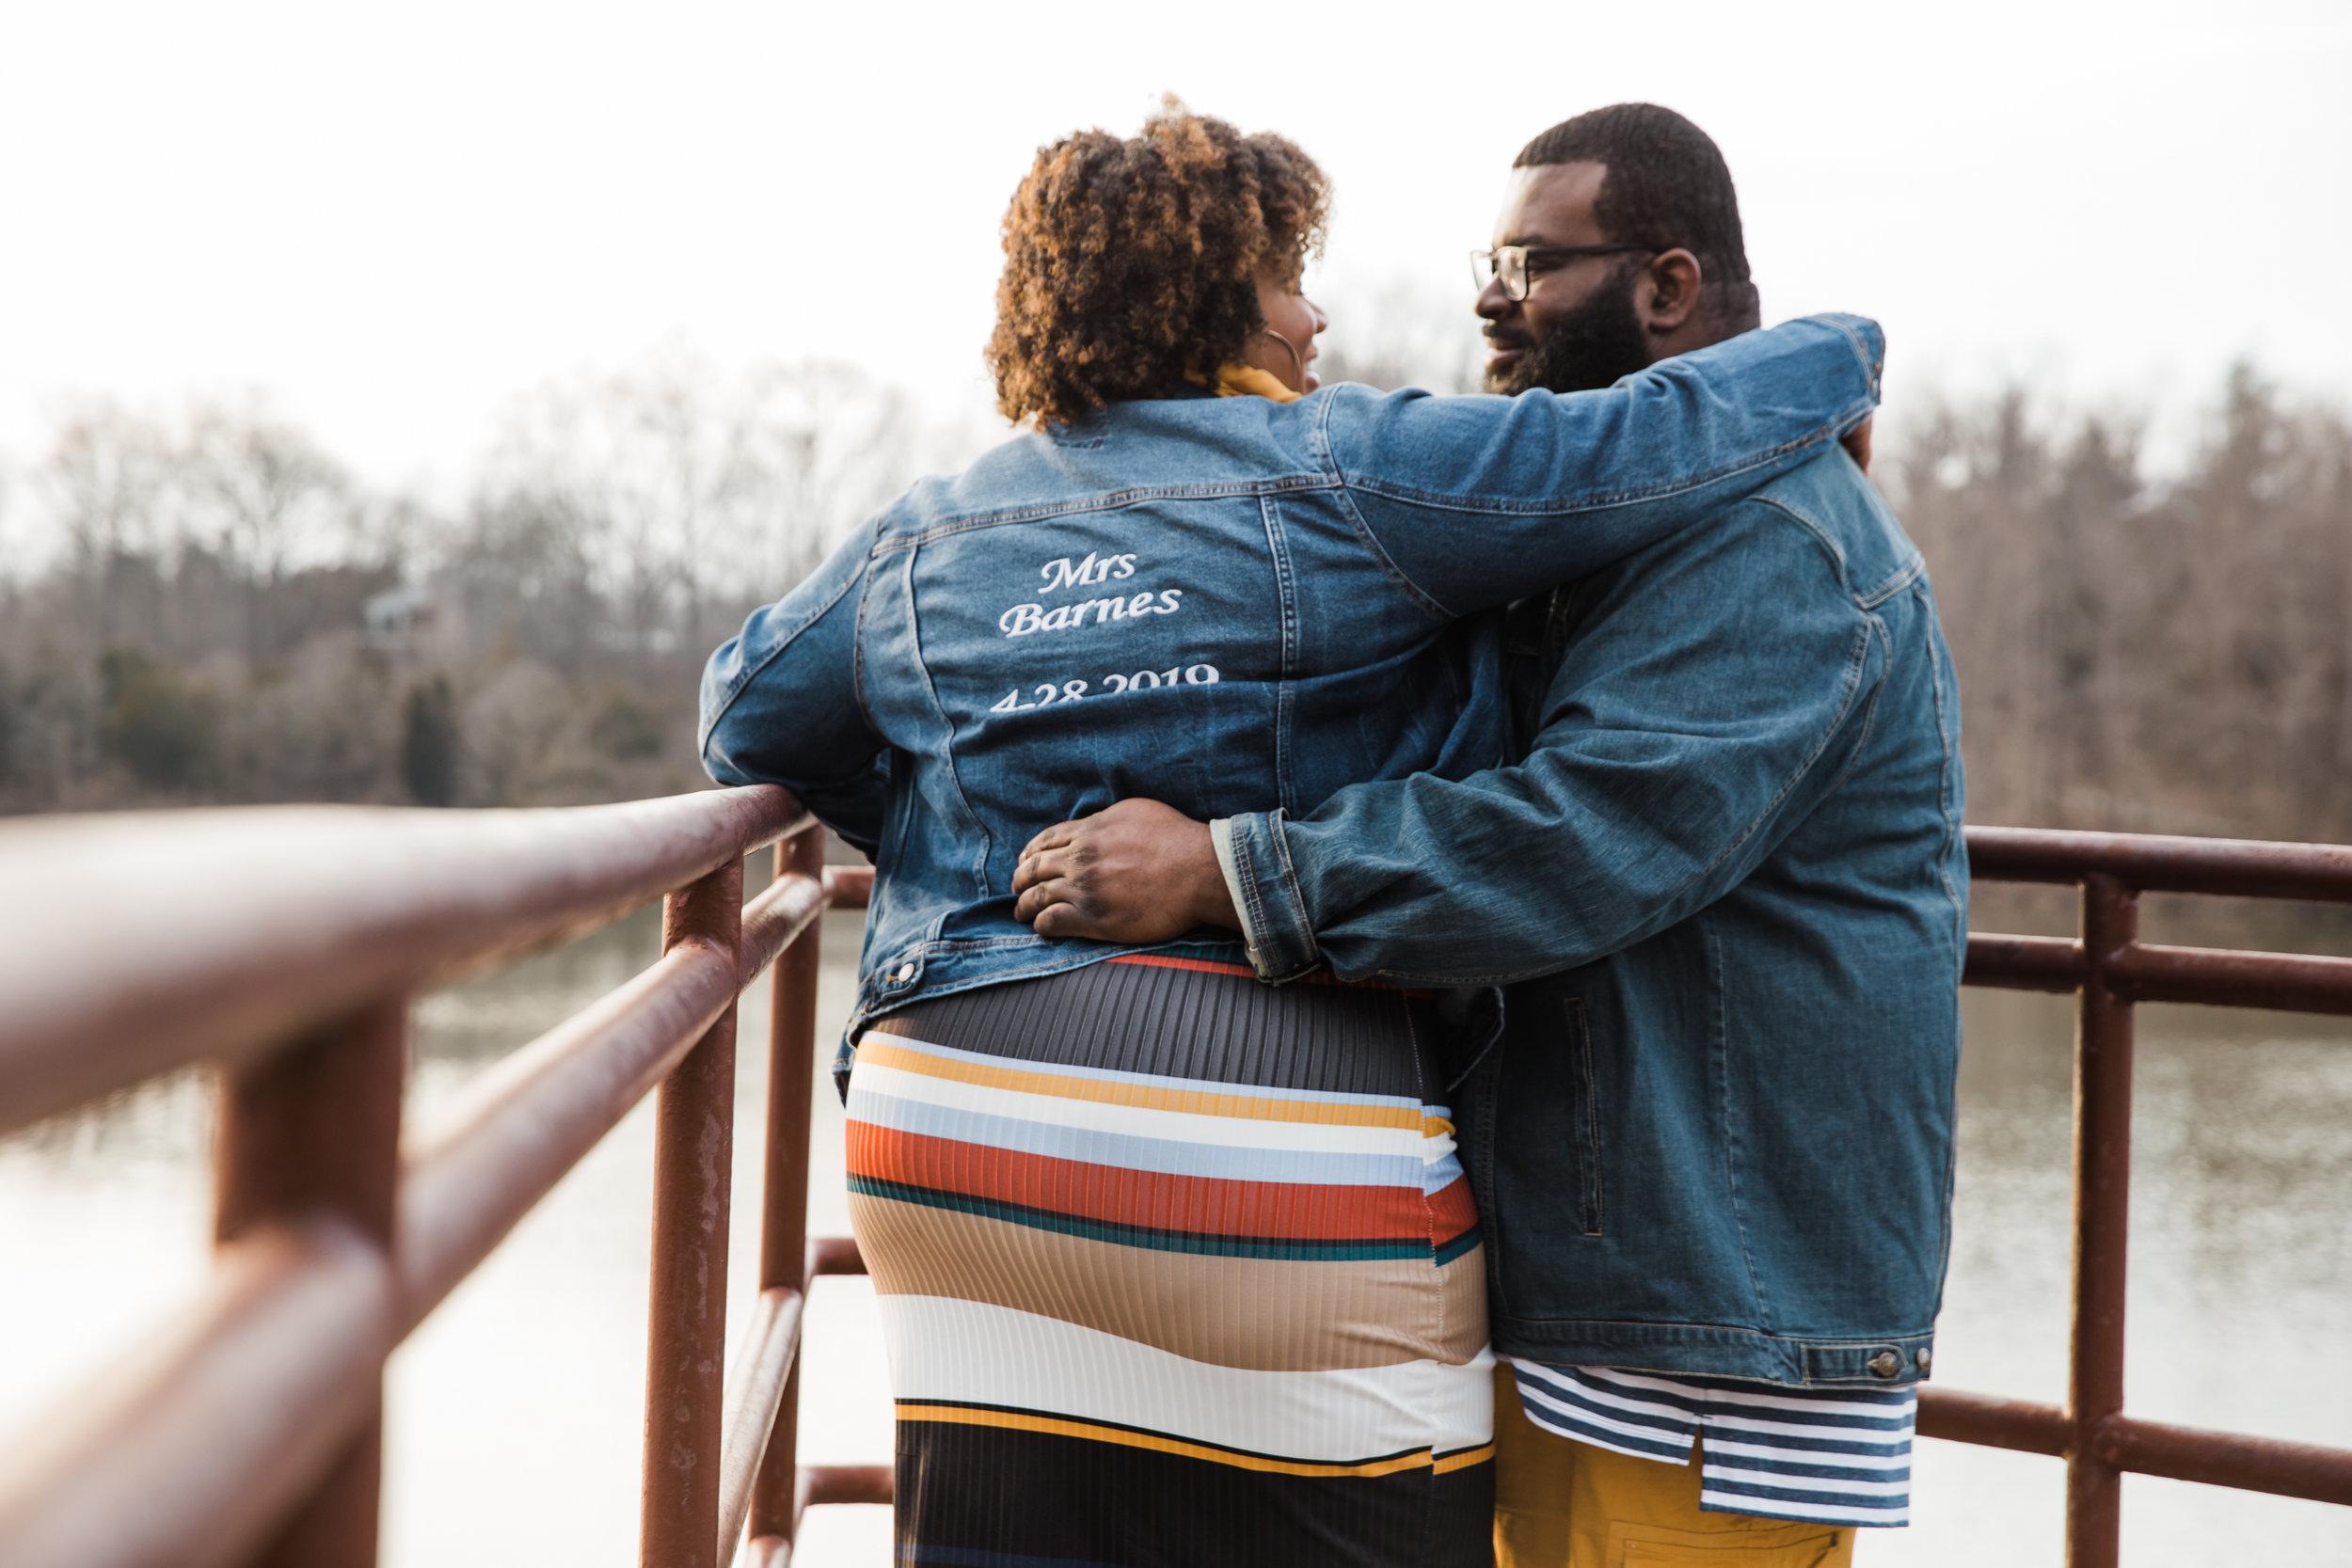 Black Natural Hair Bride Bkack Wedding Photographers Megapixels Media Photography Baltimore Maryland Centennial Park Columbia-17.jpg